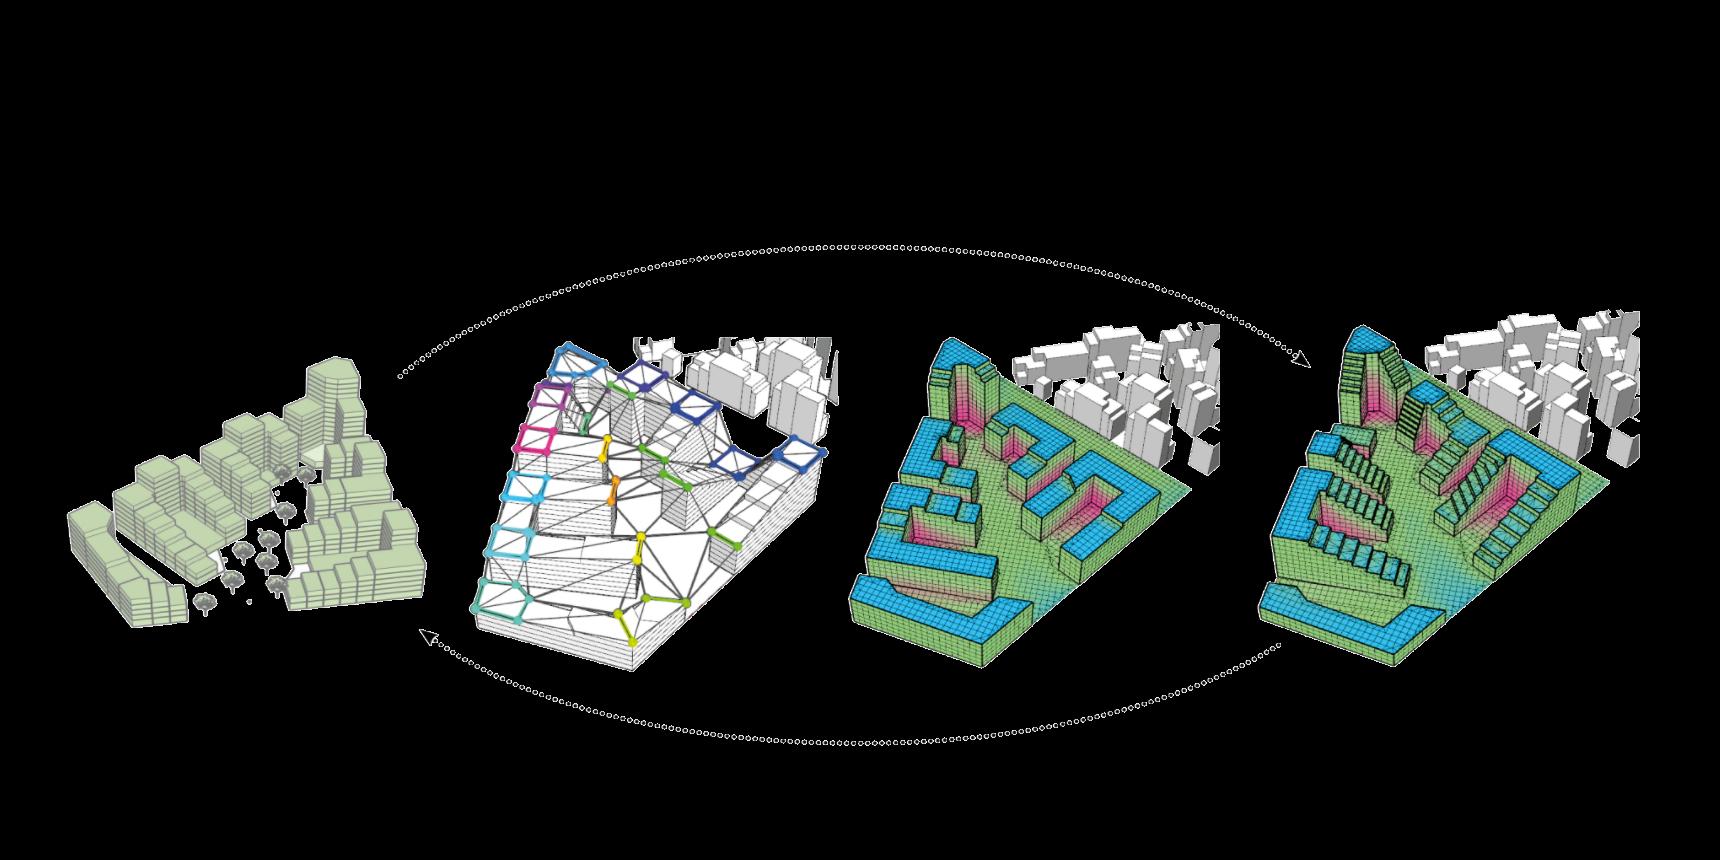 processusEvolutionnaire